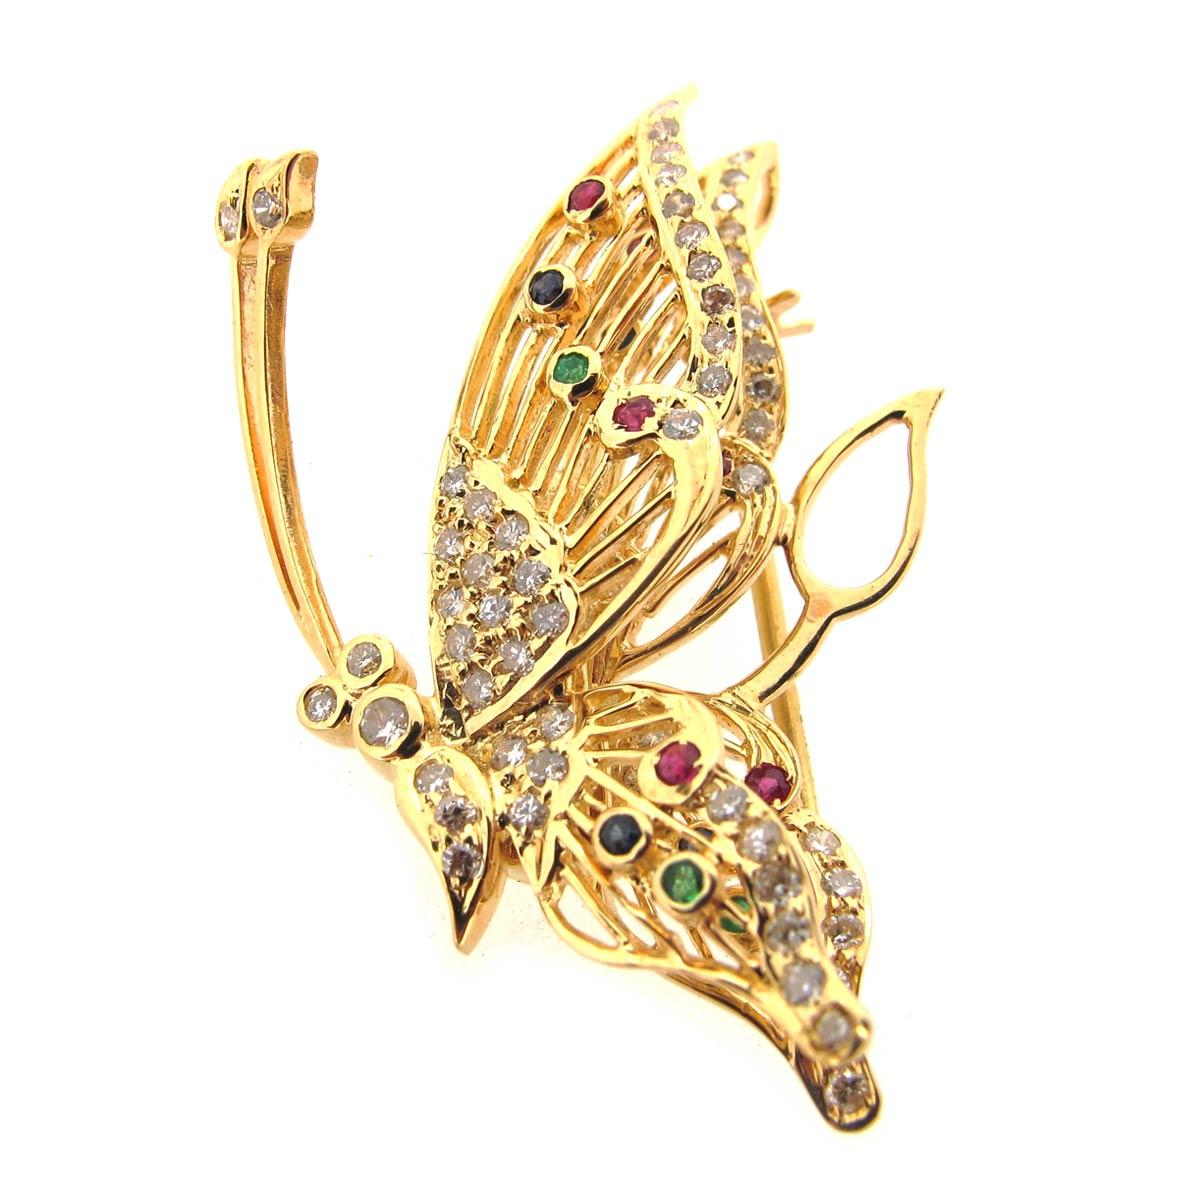 Gold & Gem Butterfly Brooch